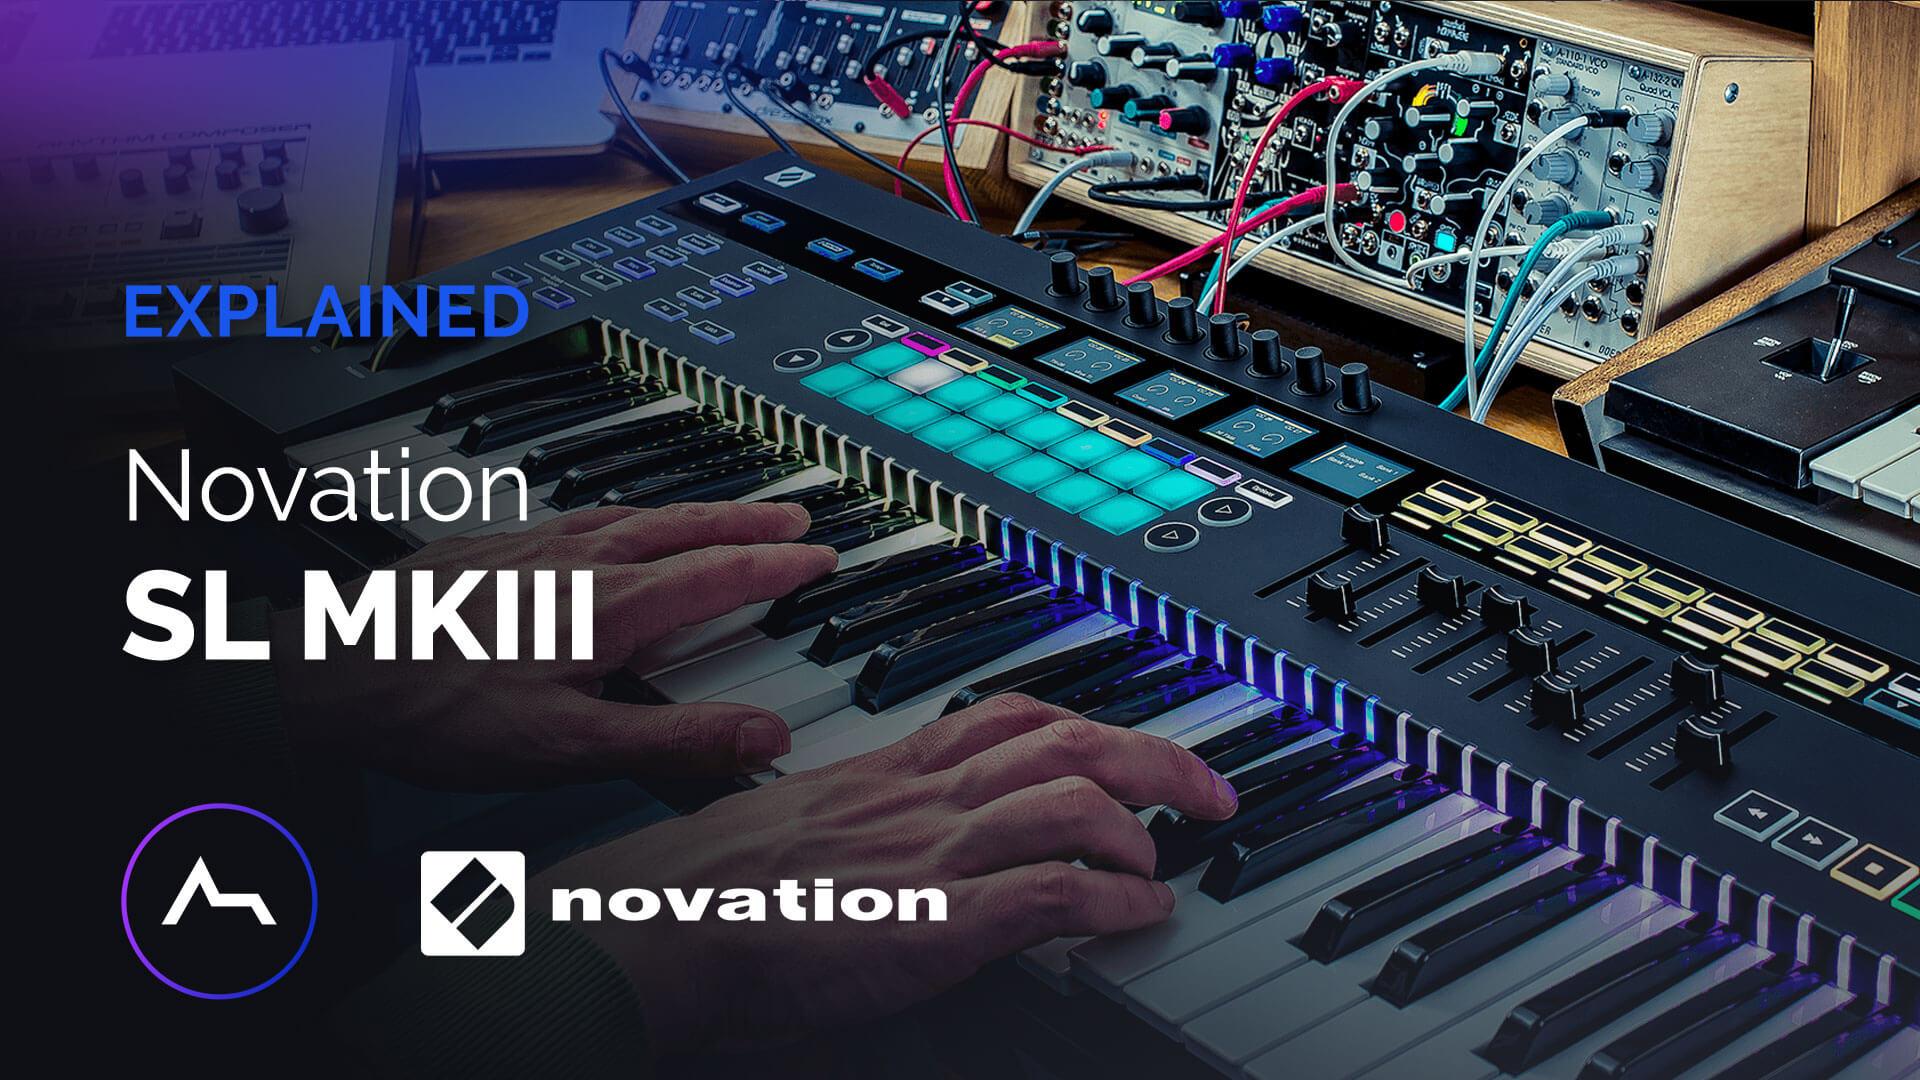 Novation SL MkIII Explained